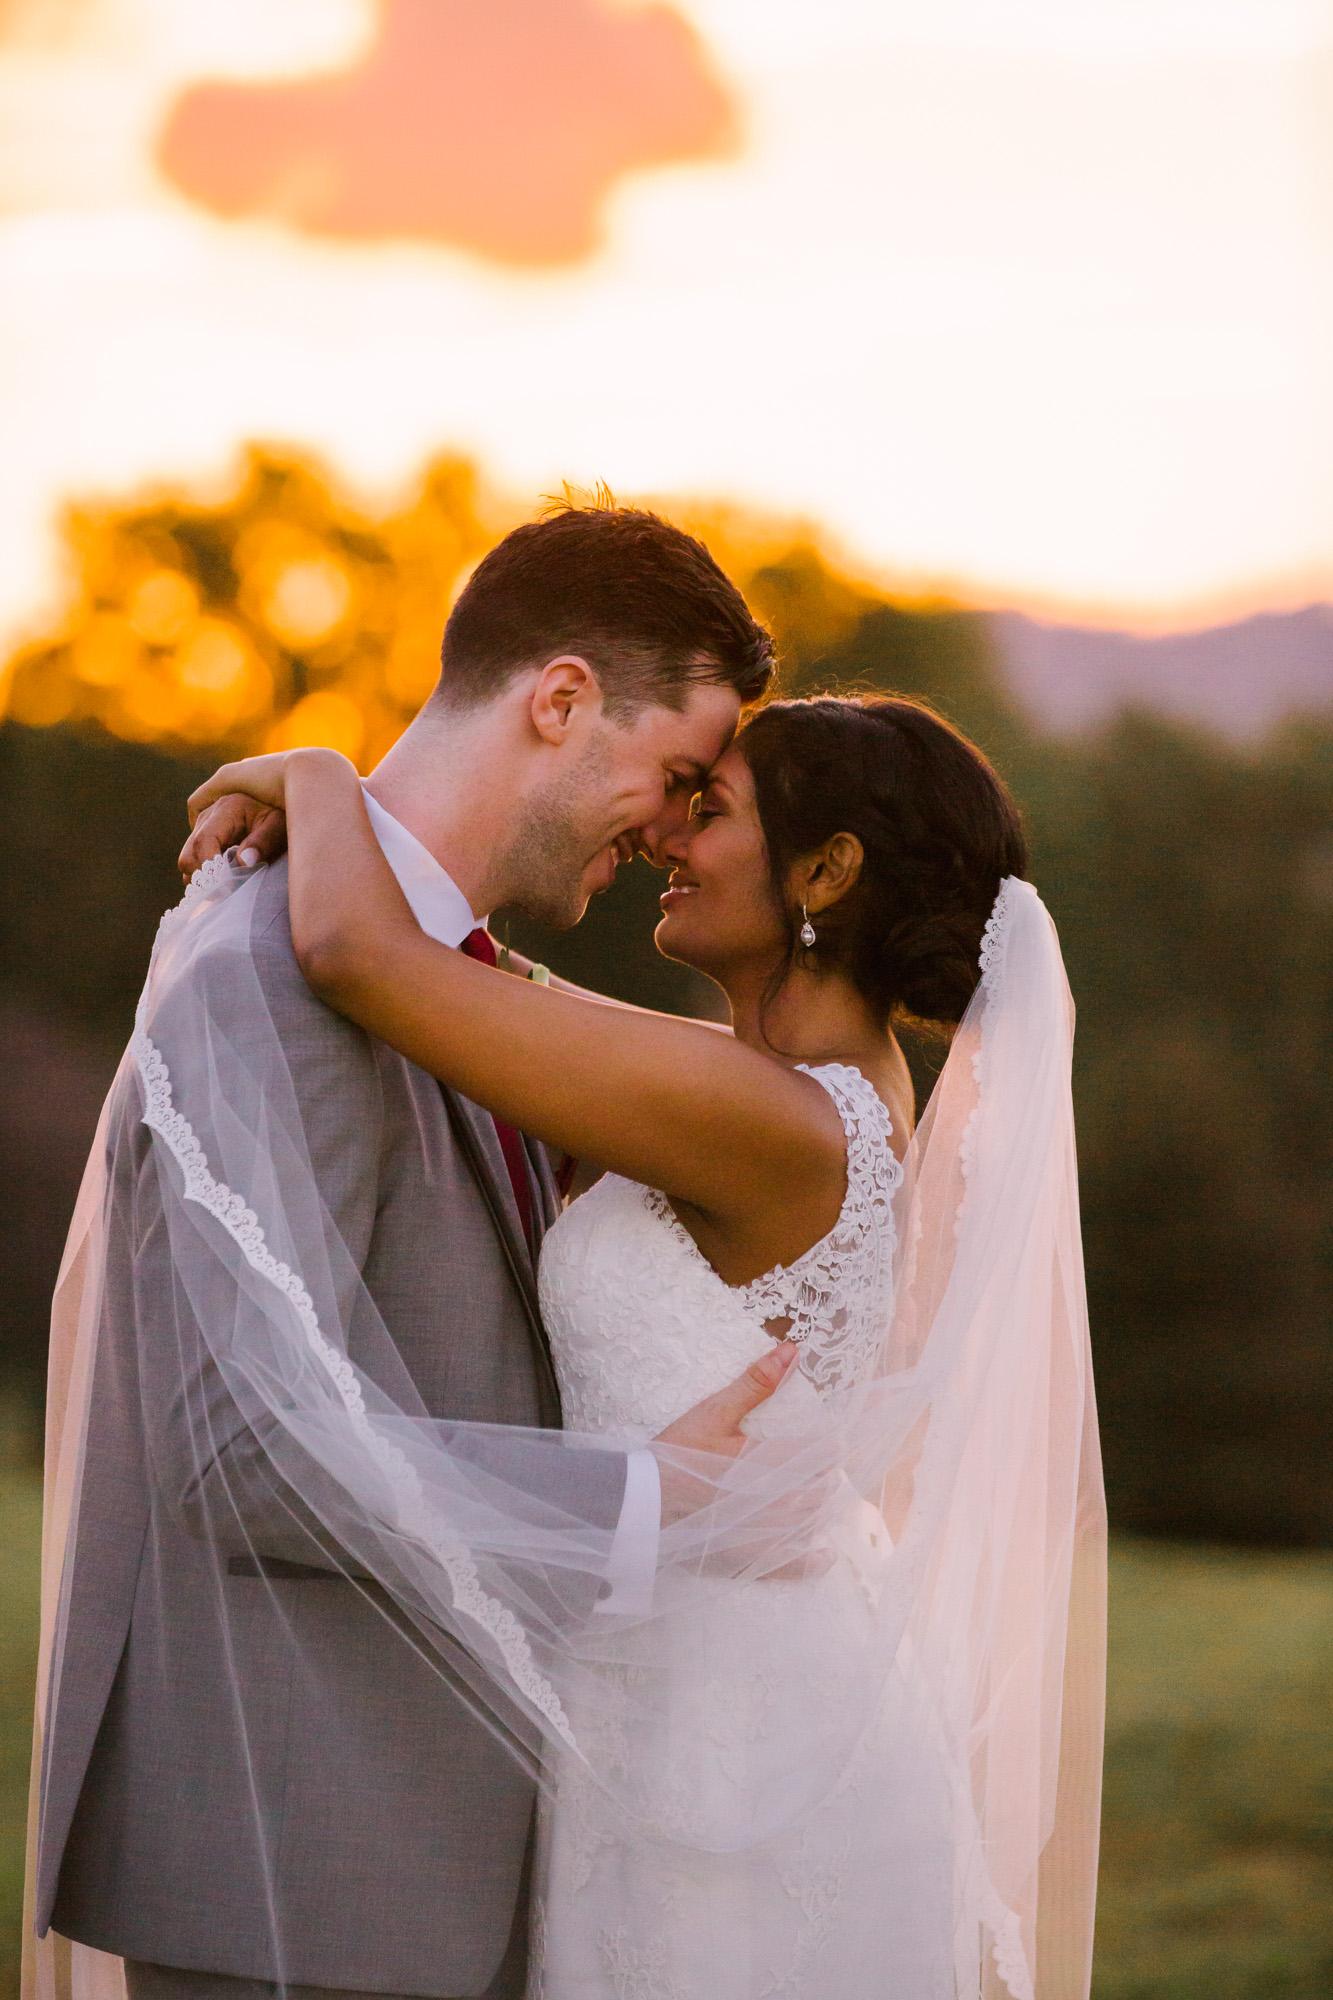 Waynesville NC Wedding Photography | Bride and Groom Hugging at Sunset